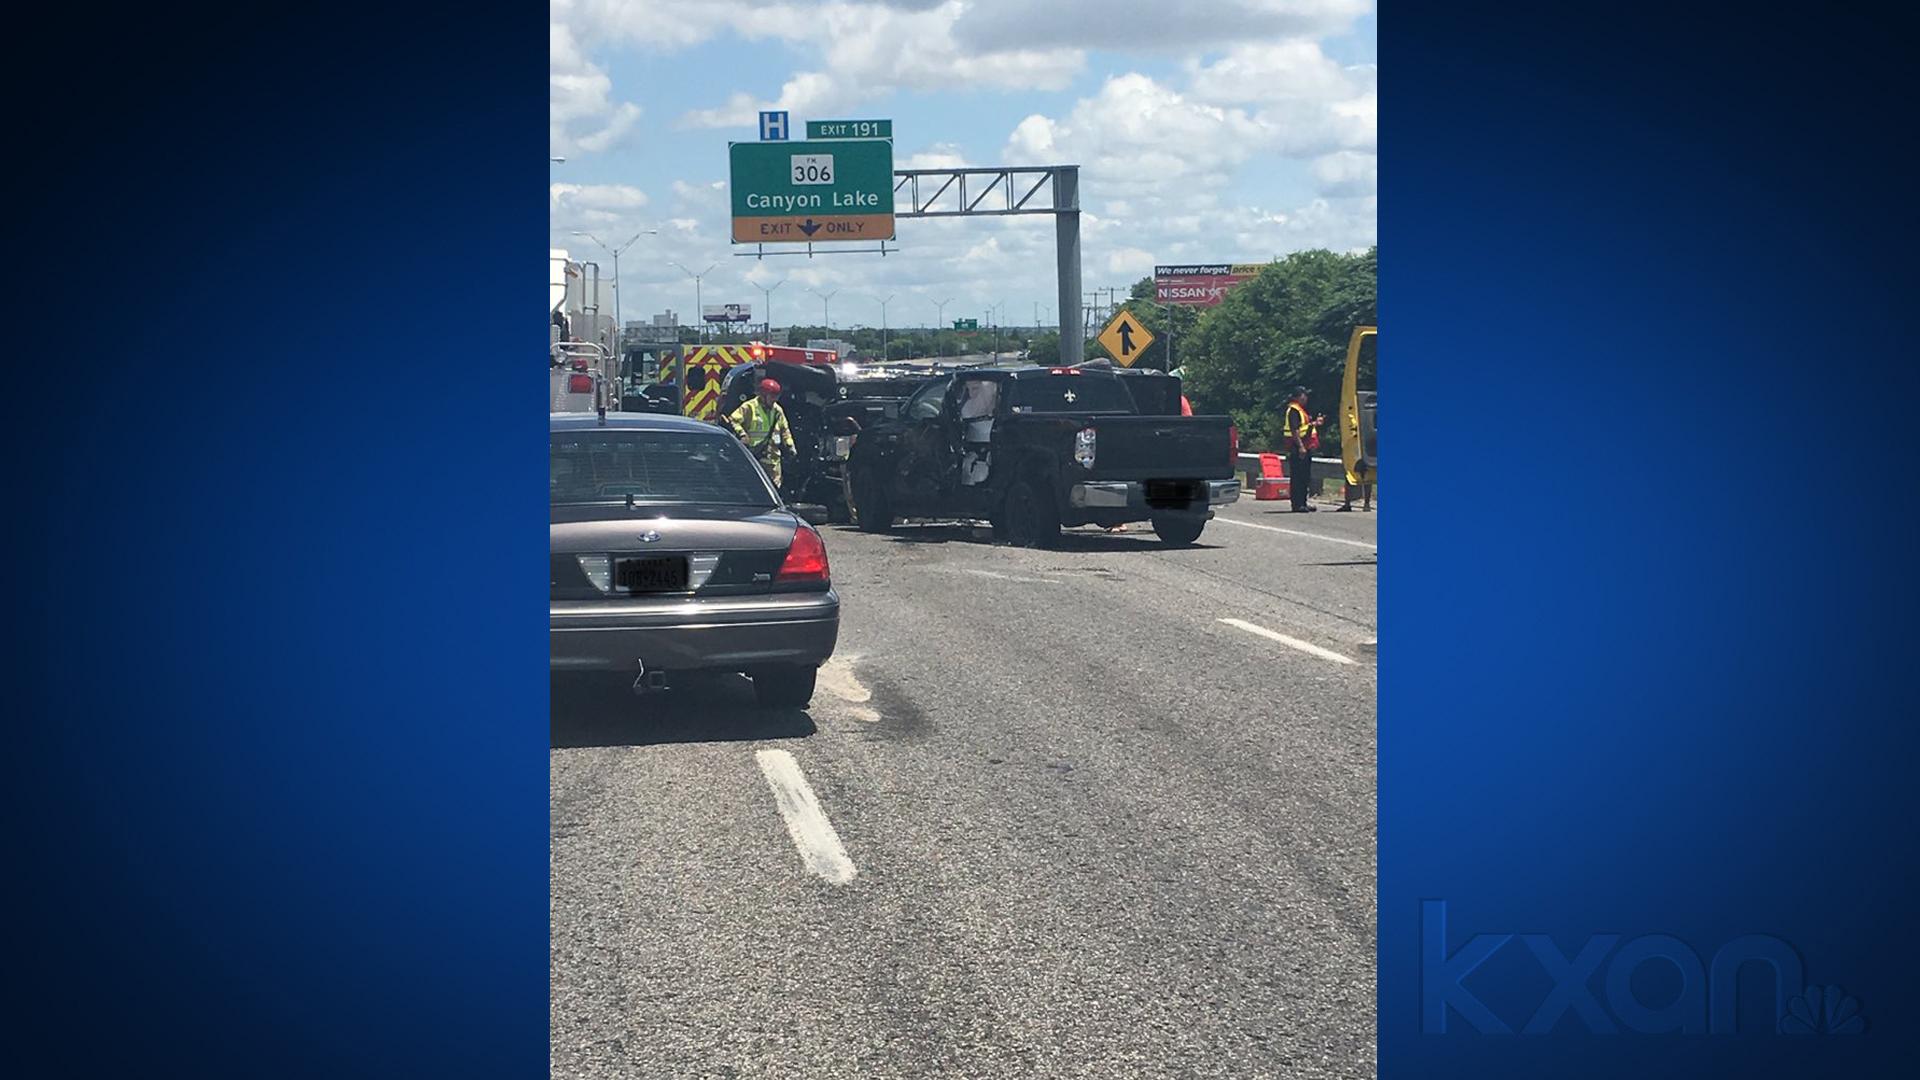 Rollover crash on I-35 in New Braunfels shut down highway to